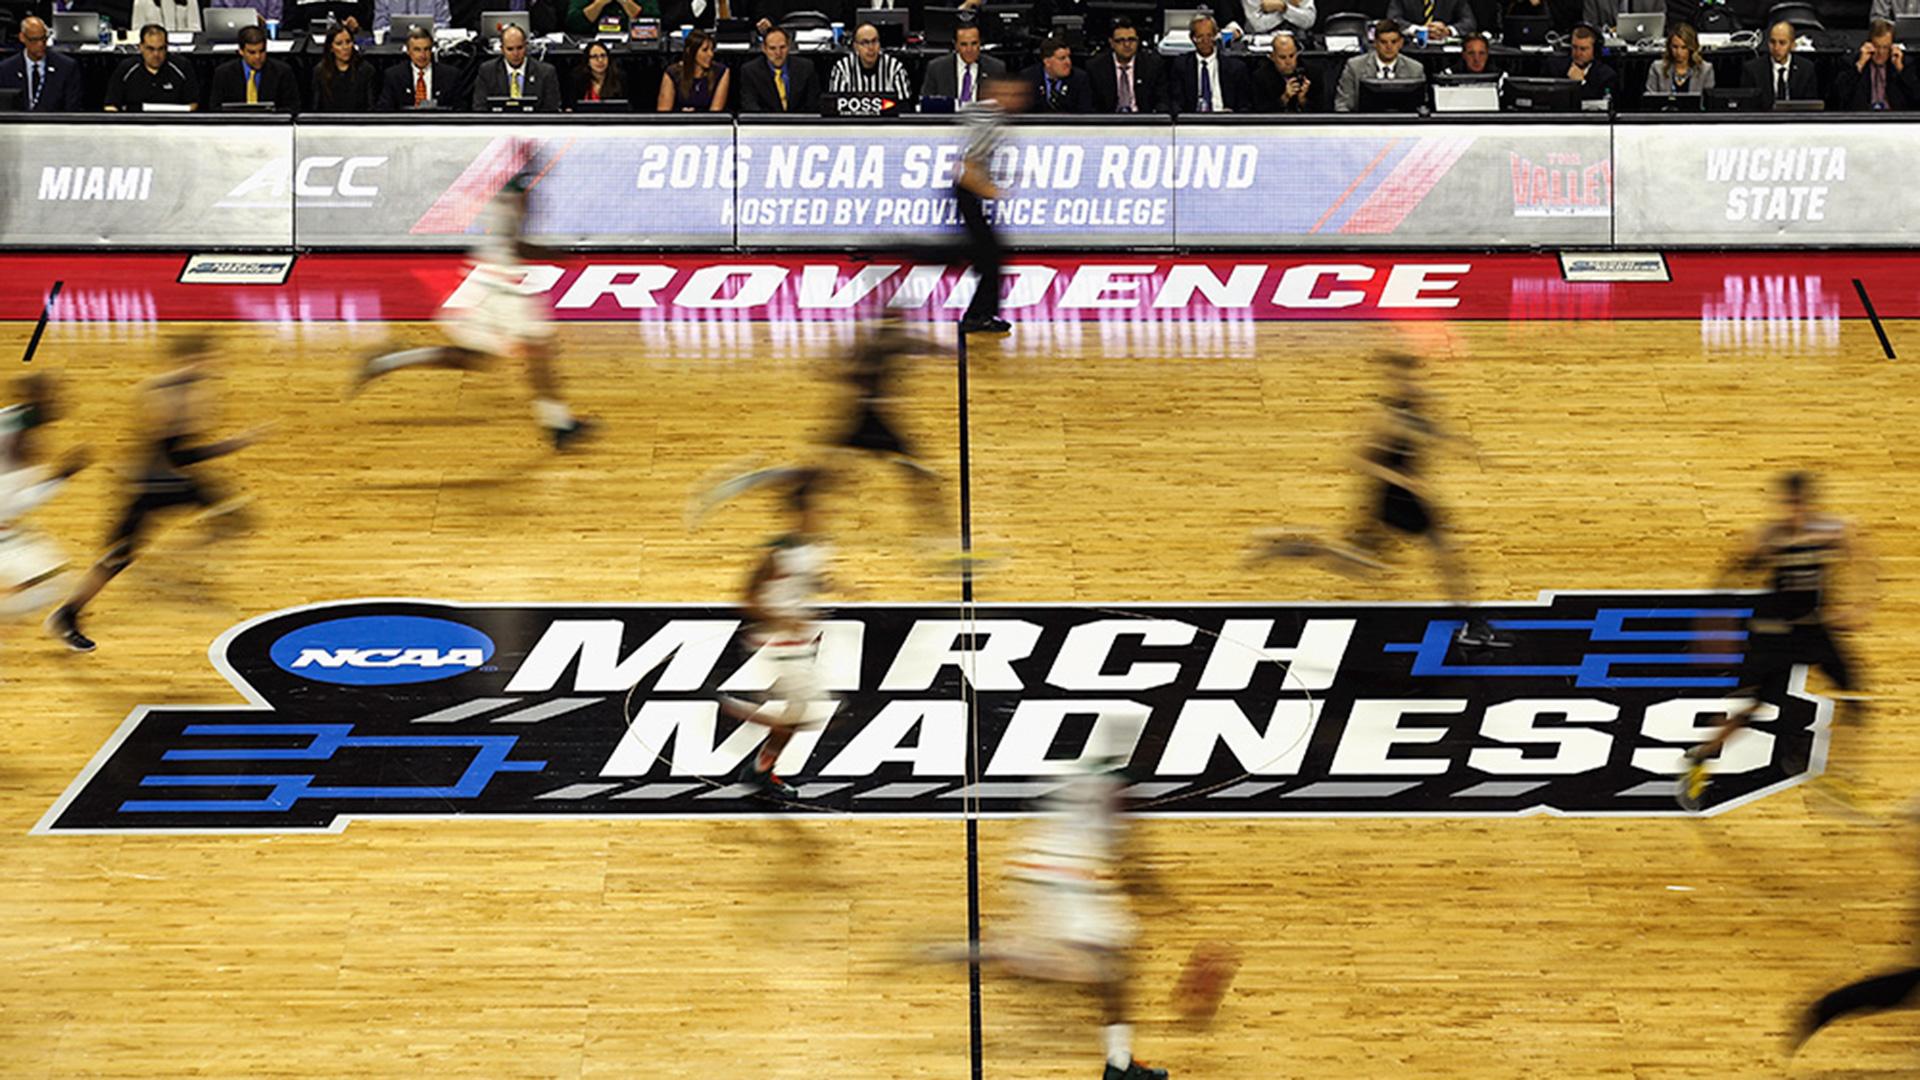 When does March Madness start? 2019 NCAA Tournament schedule, dates, bracket